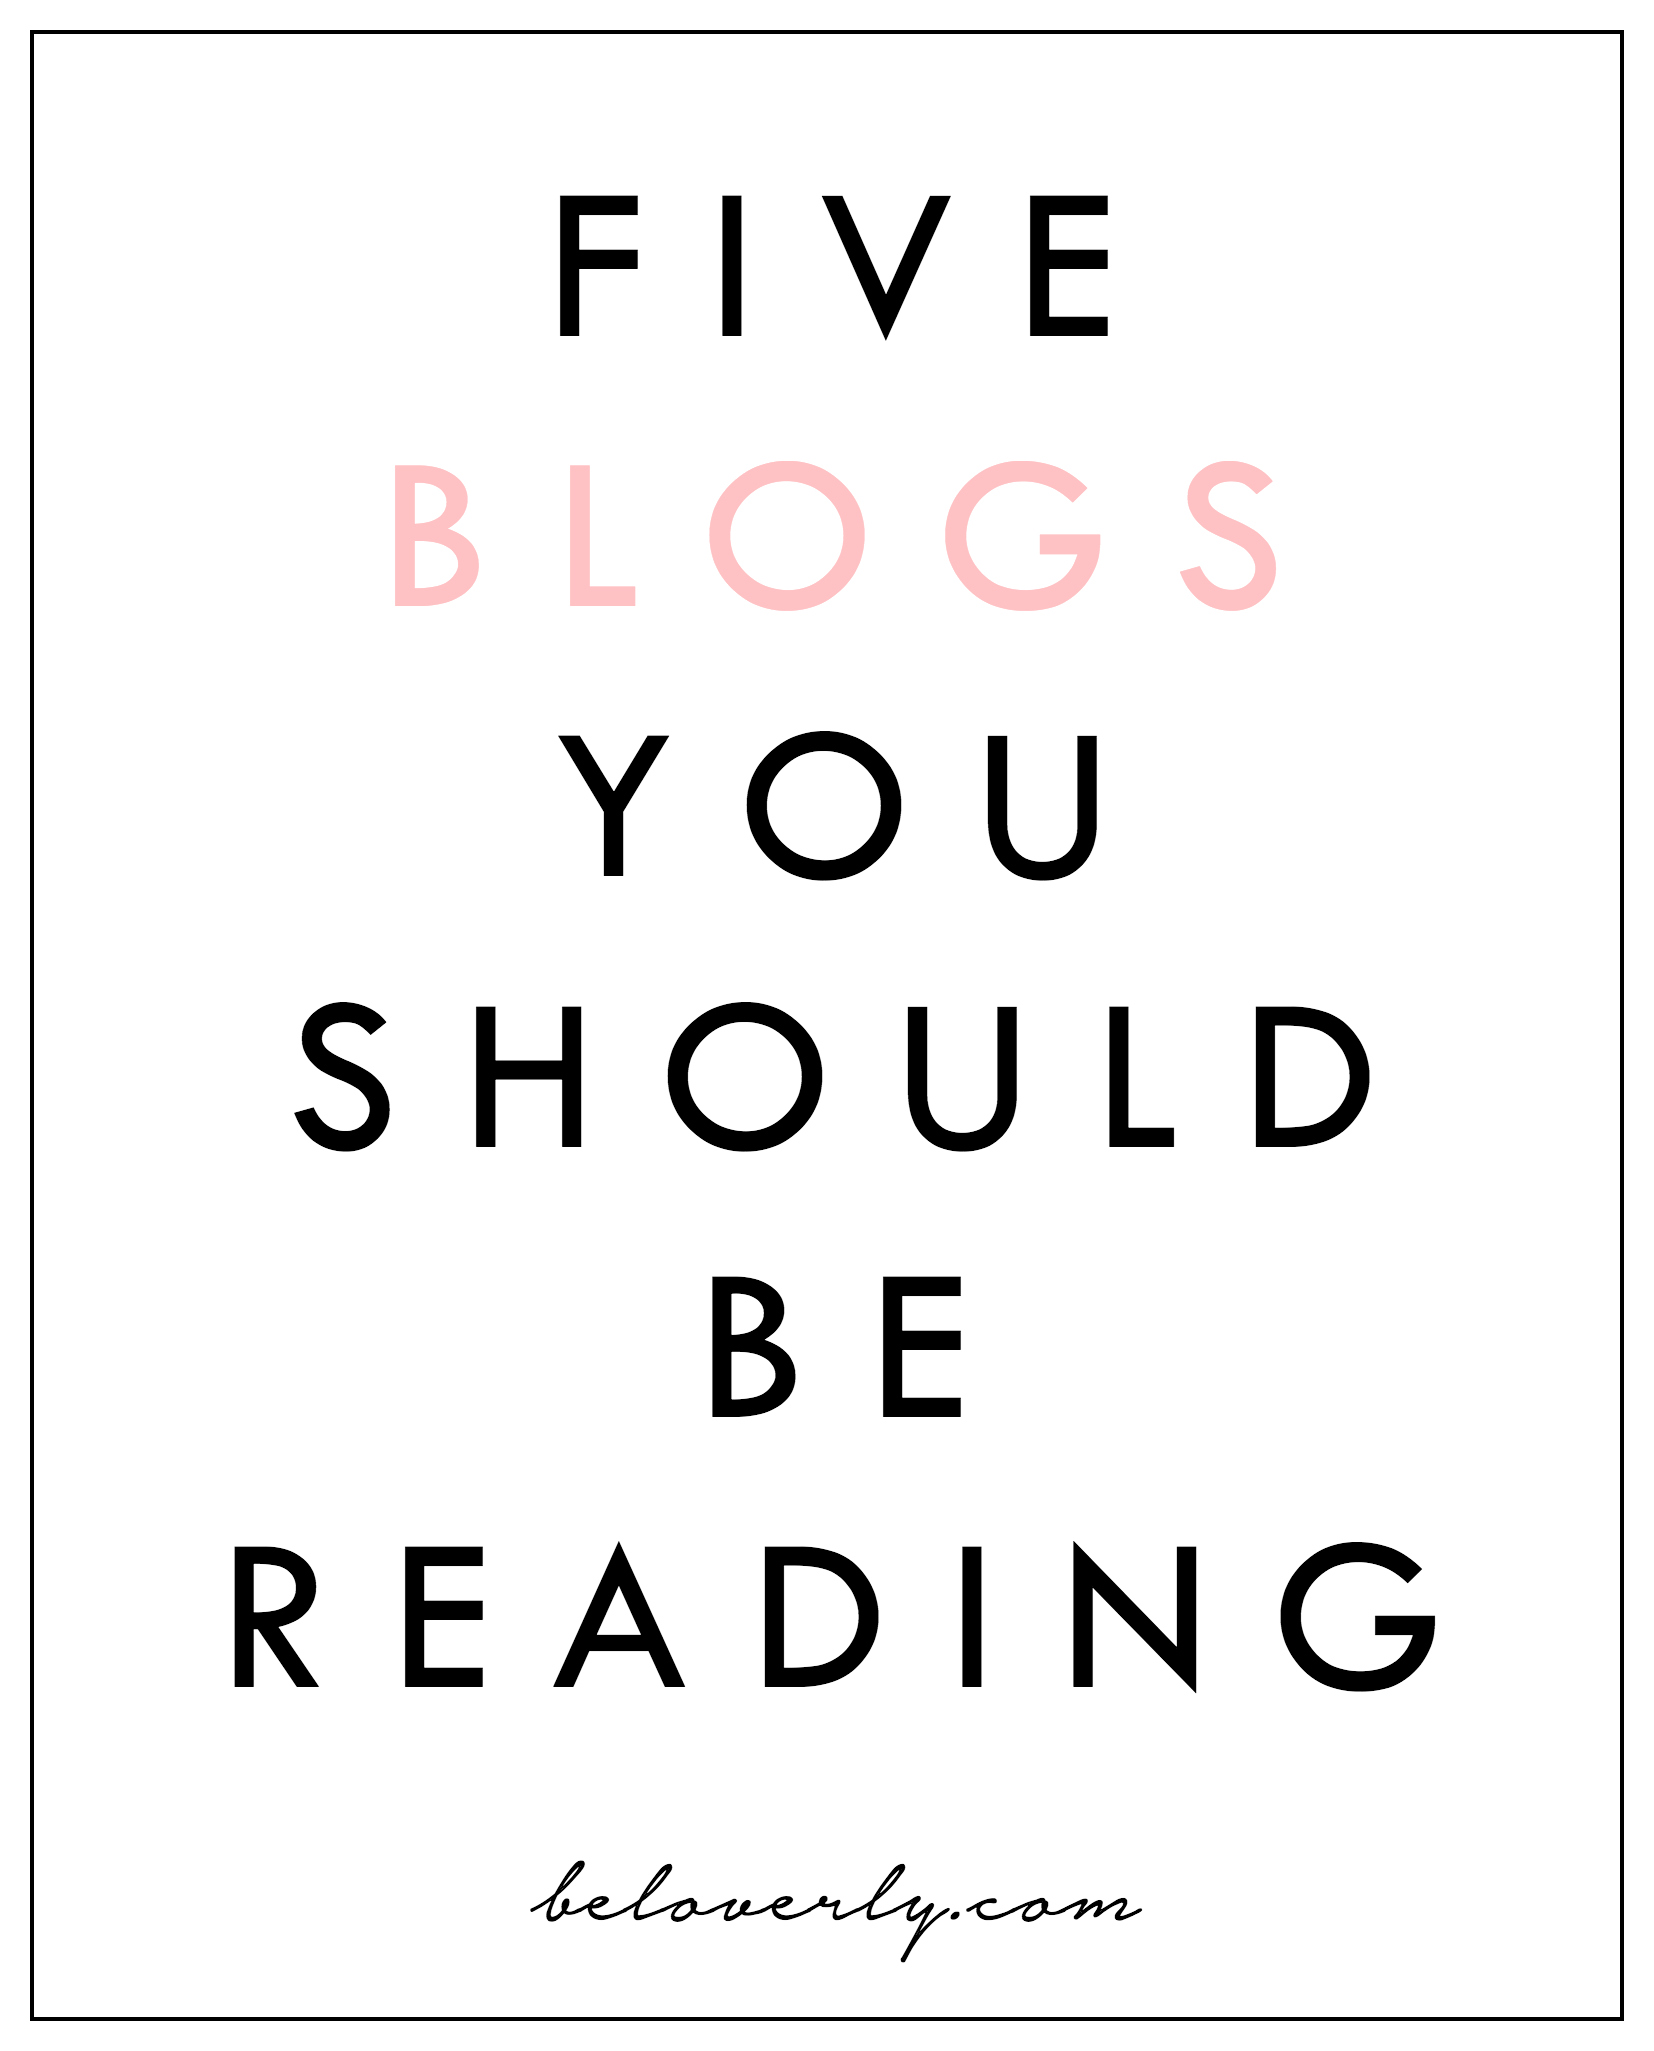 fiveblogsyoushouldbereading